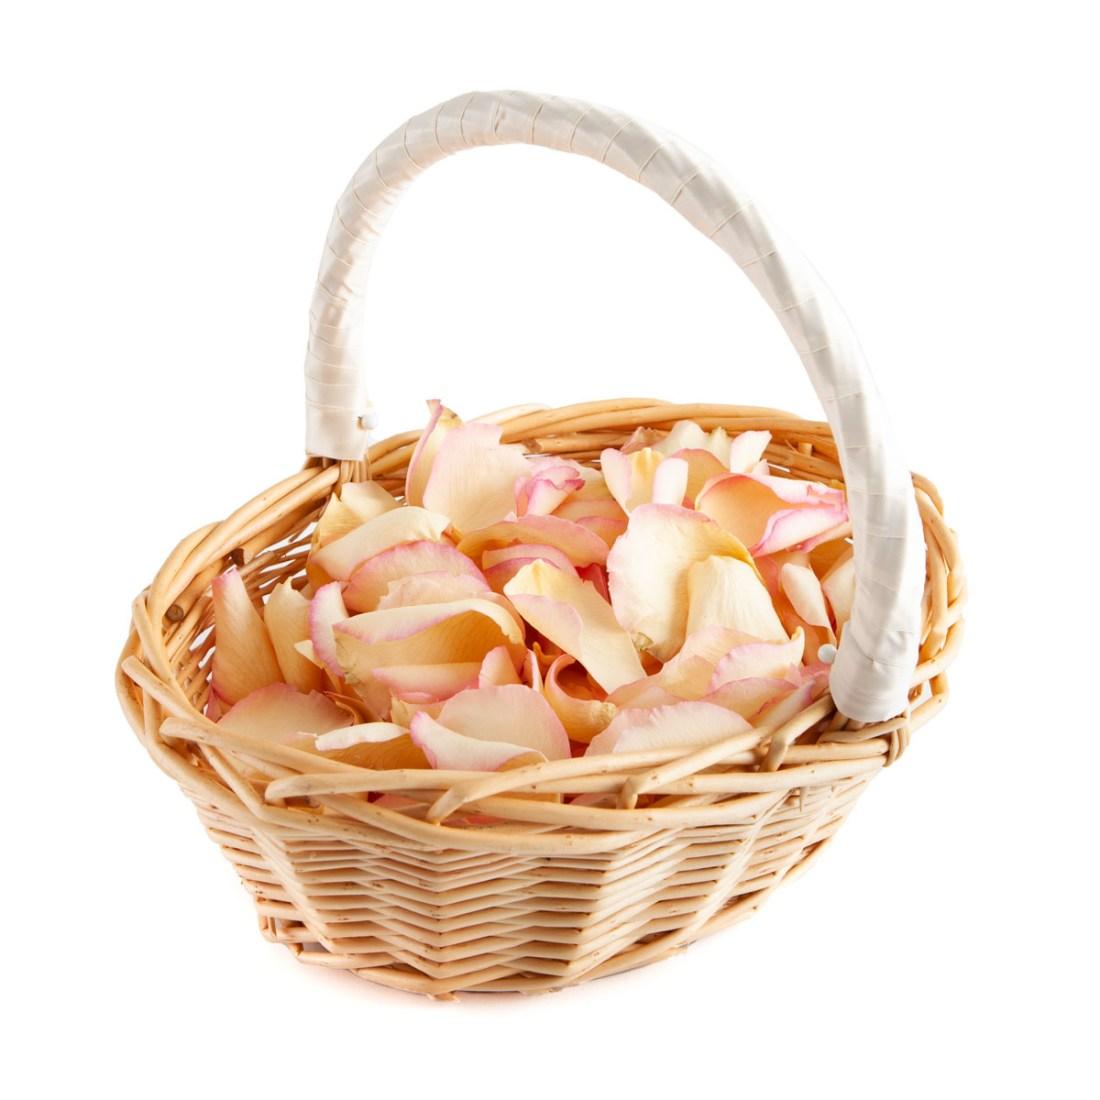 Pink & Cream Rose Petals in a Flower Girl Basket